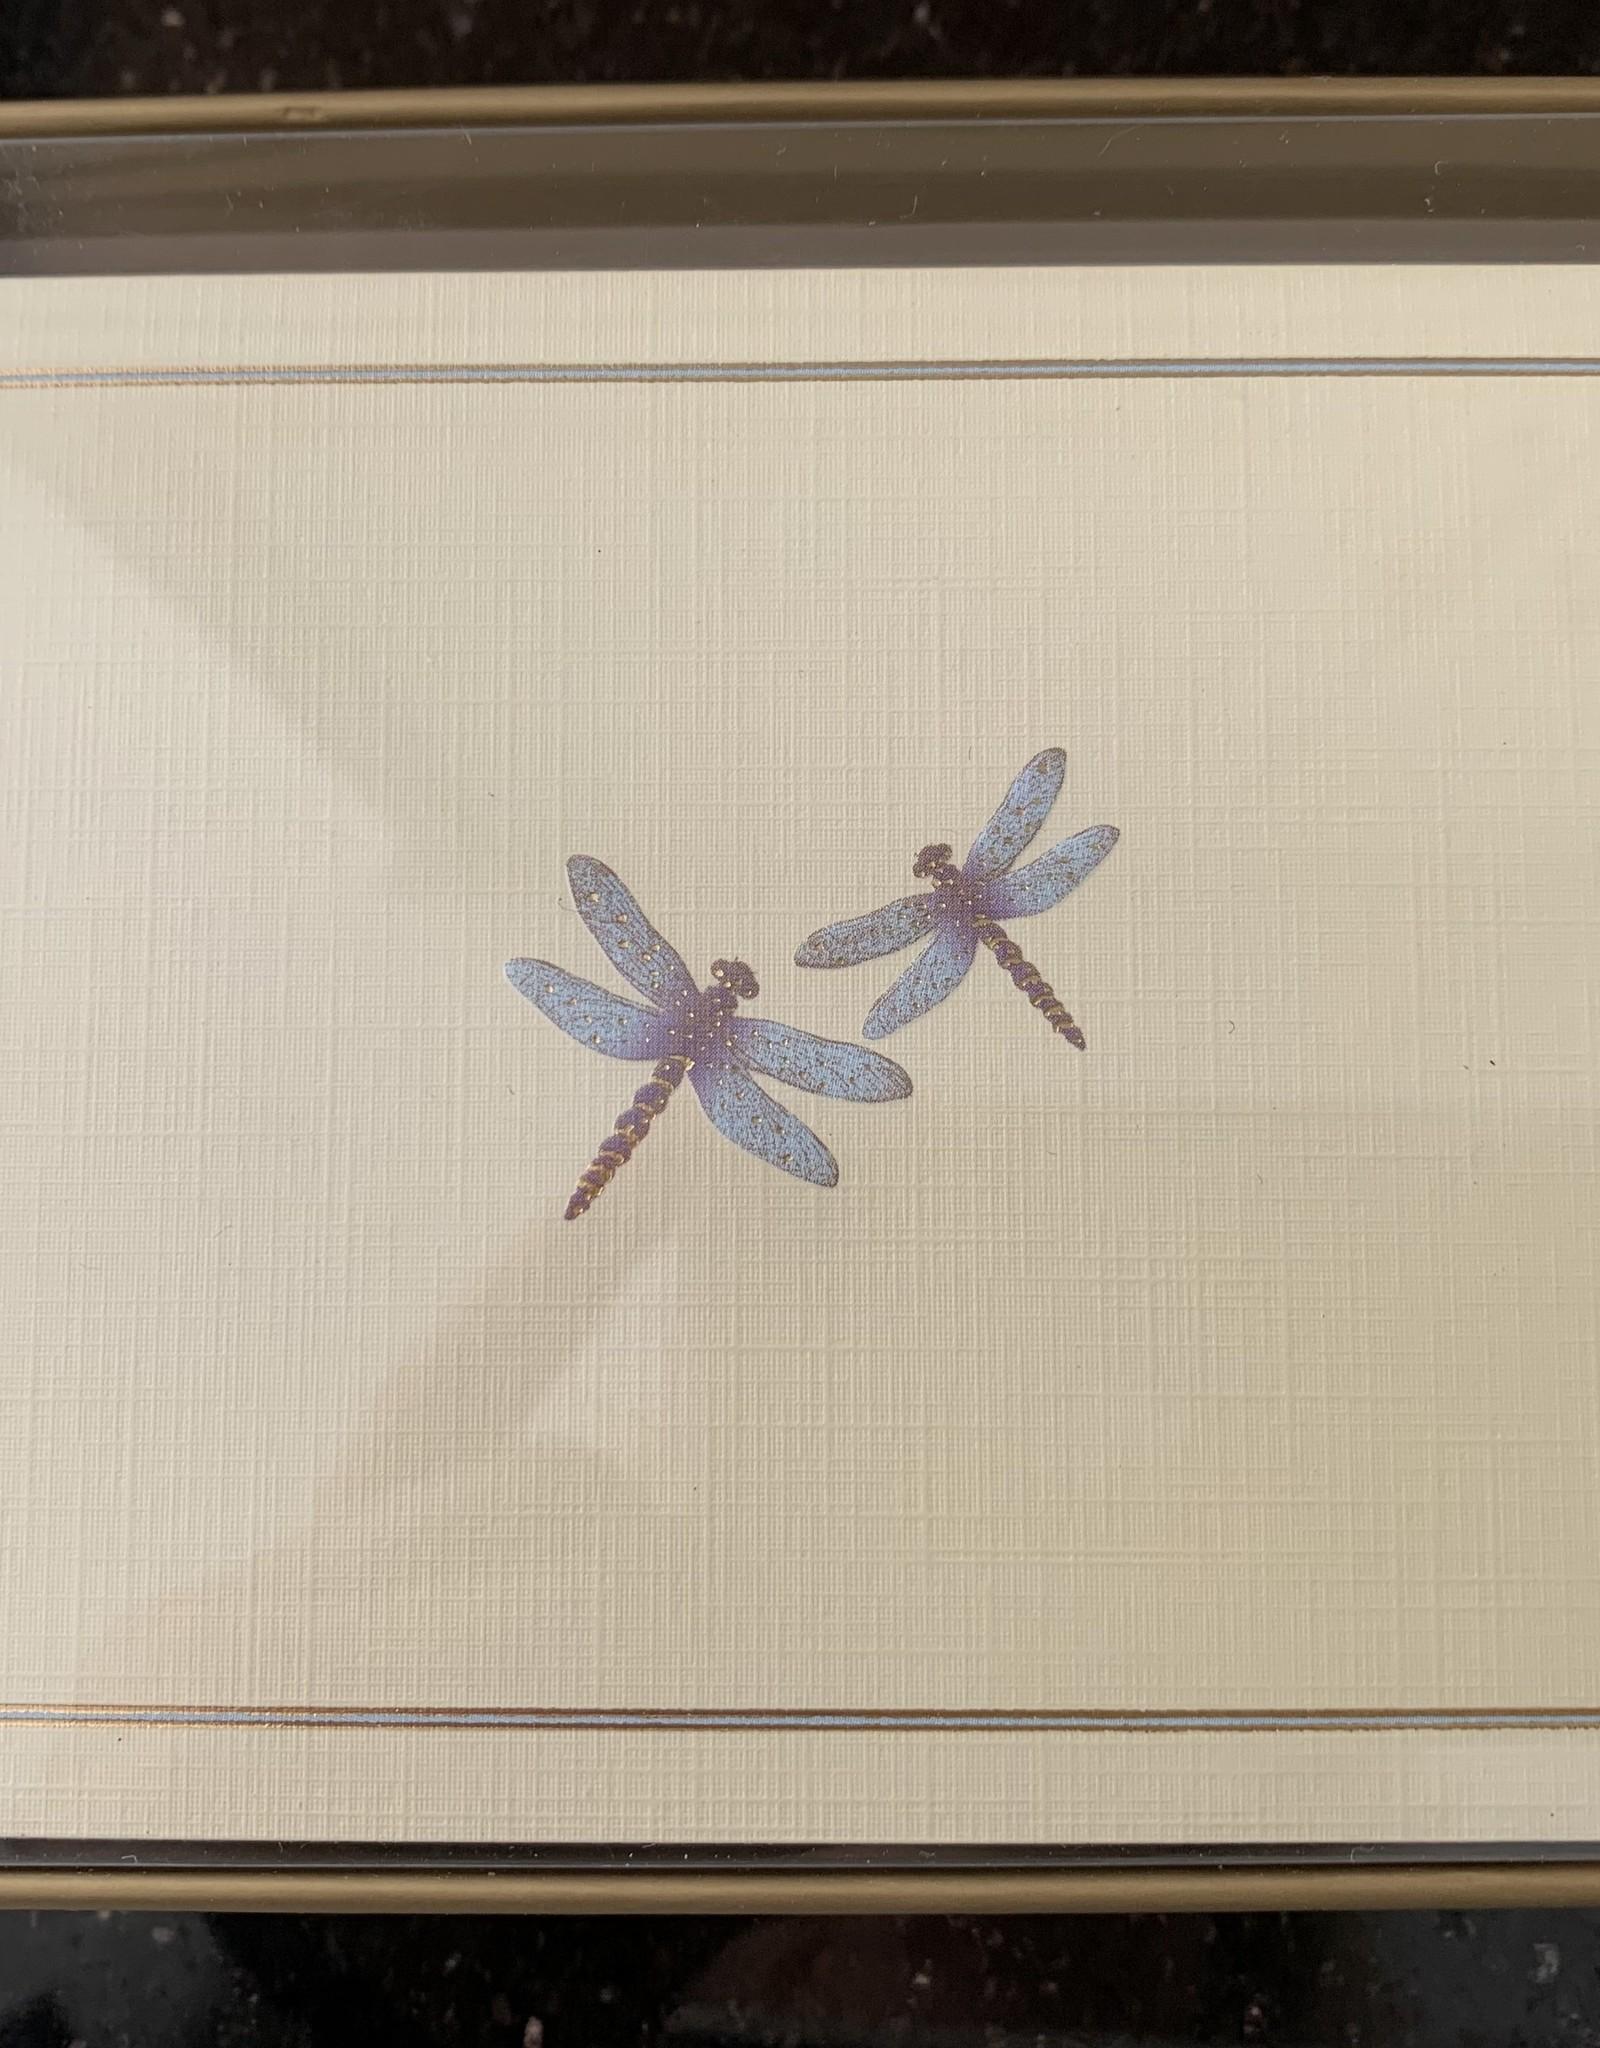 PETER PAUPER PRESS BOXED NOTECARDS - DRAGONFLIES